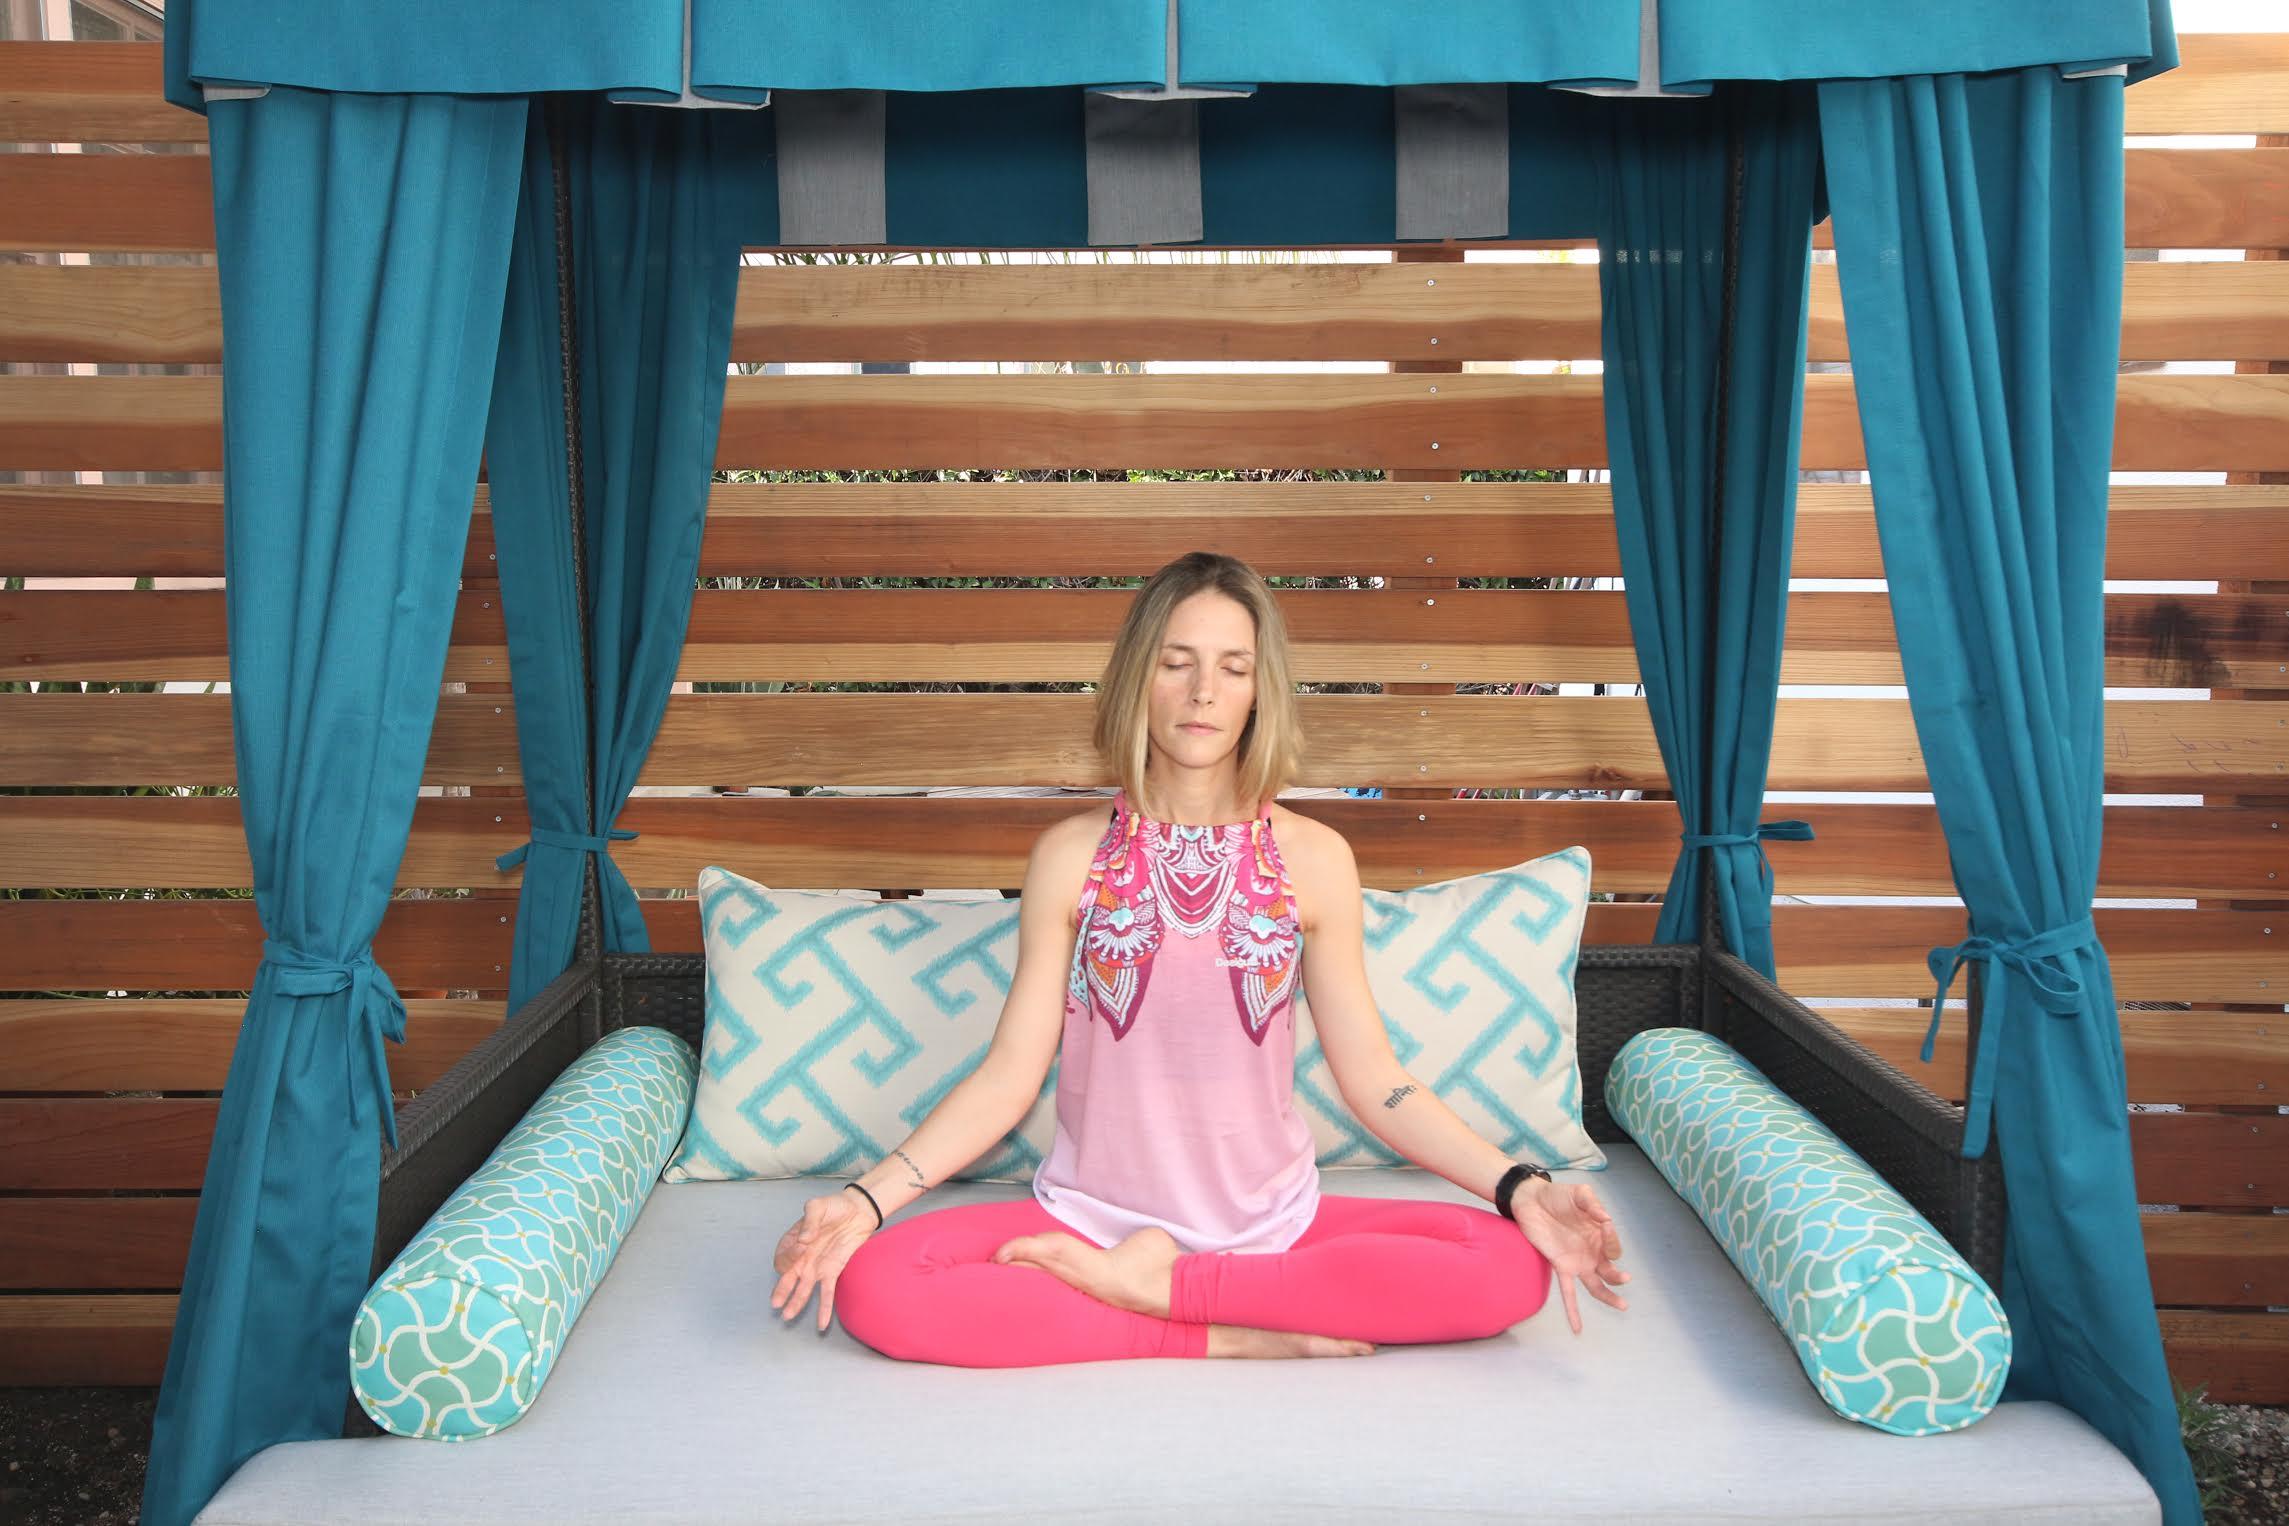 outdoor meditation lounge with yogi on meditation bed